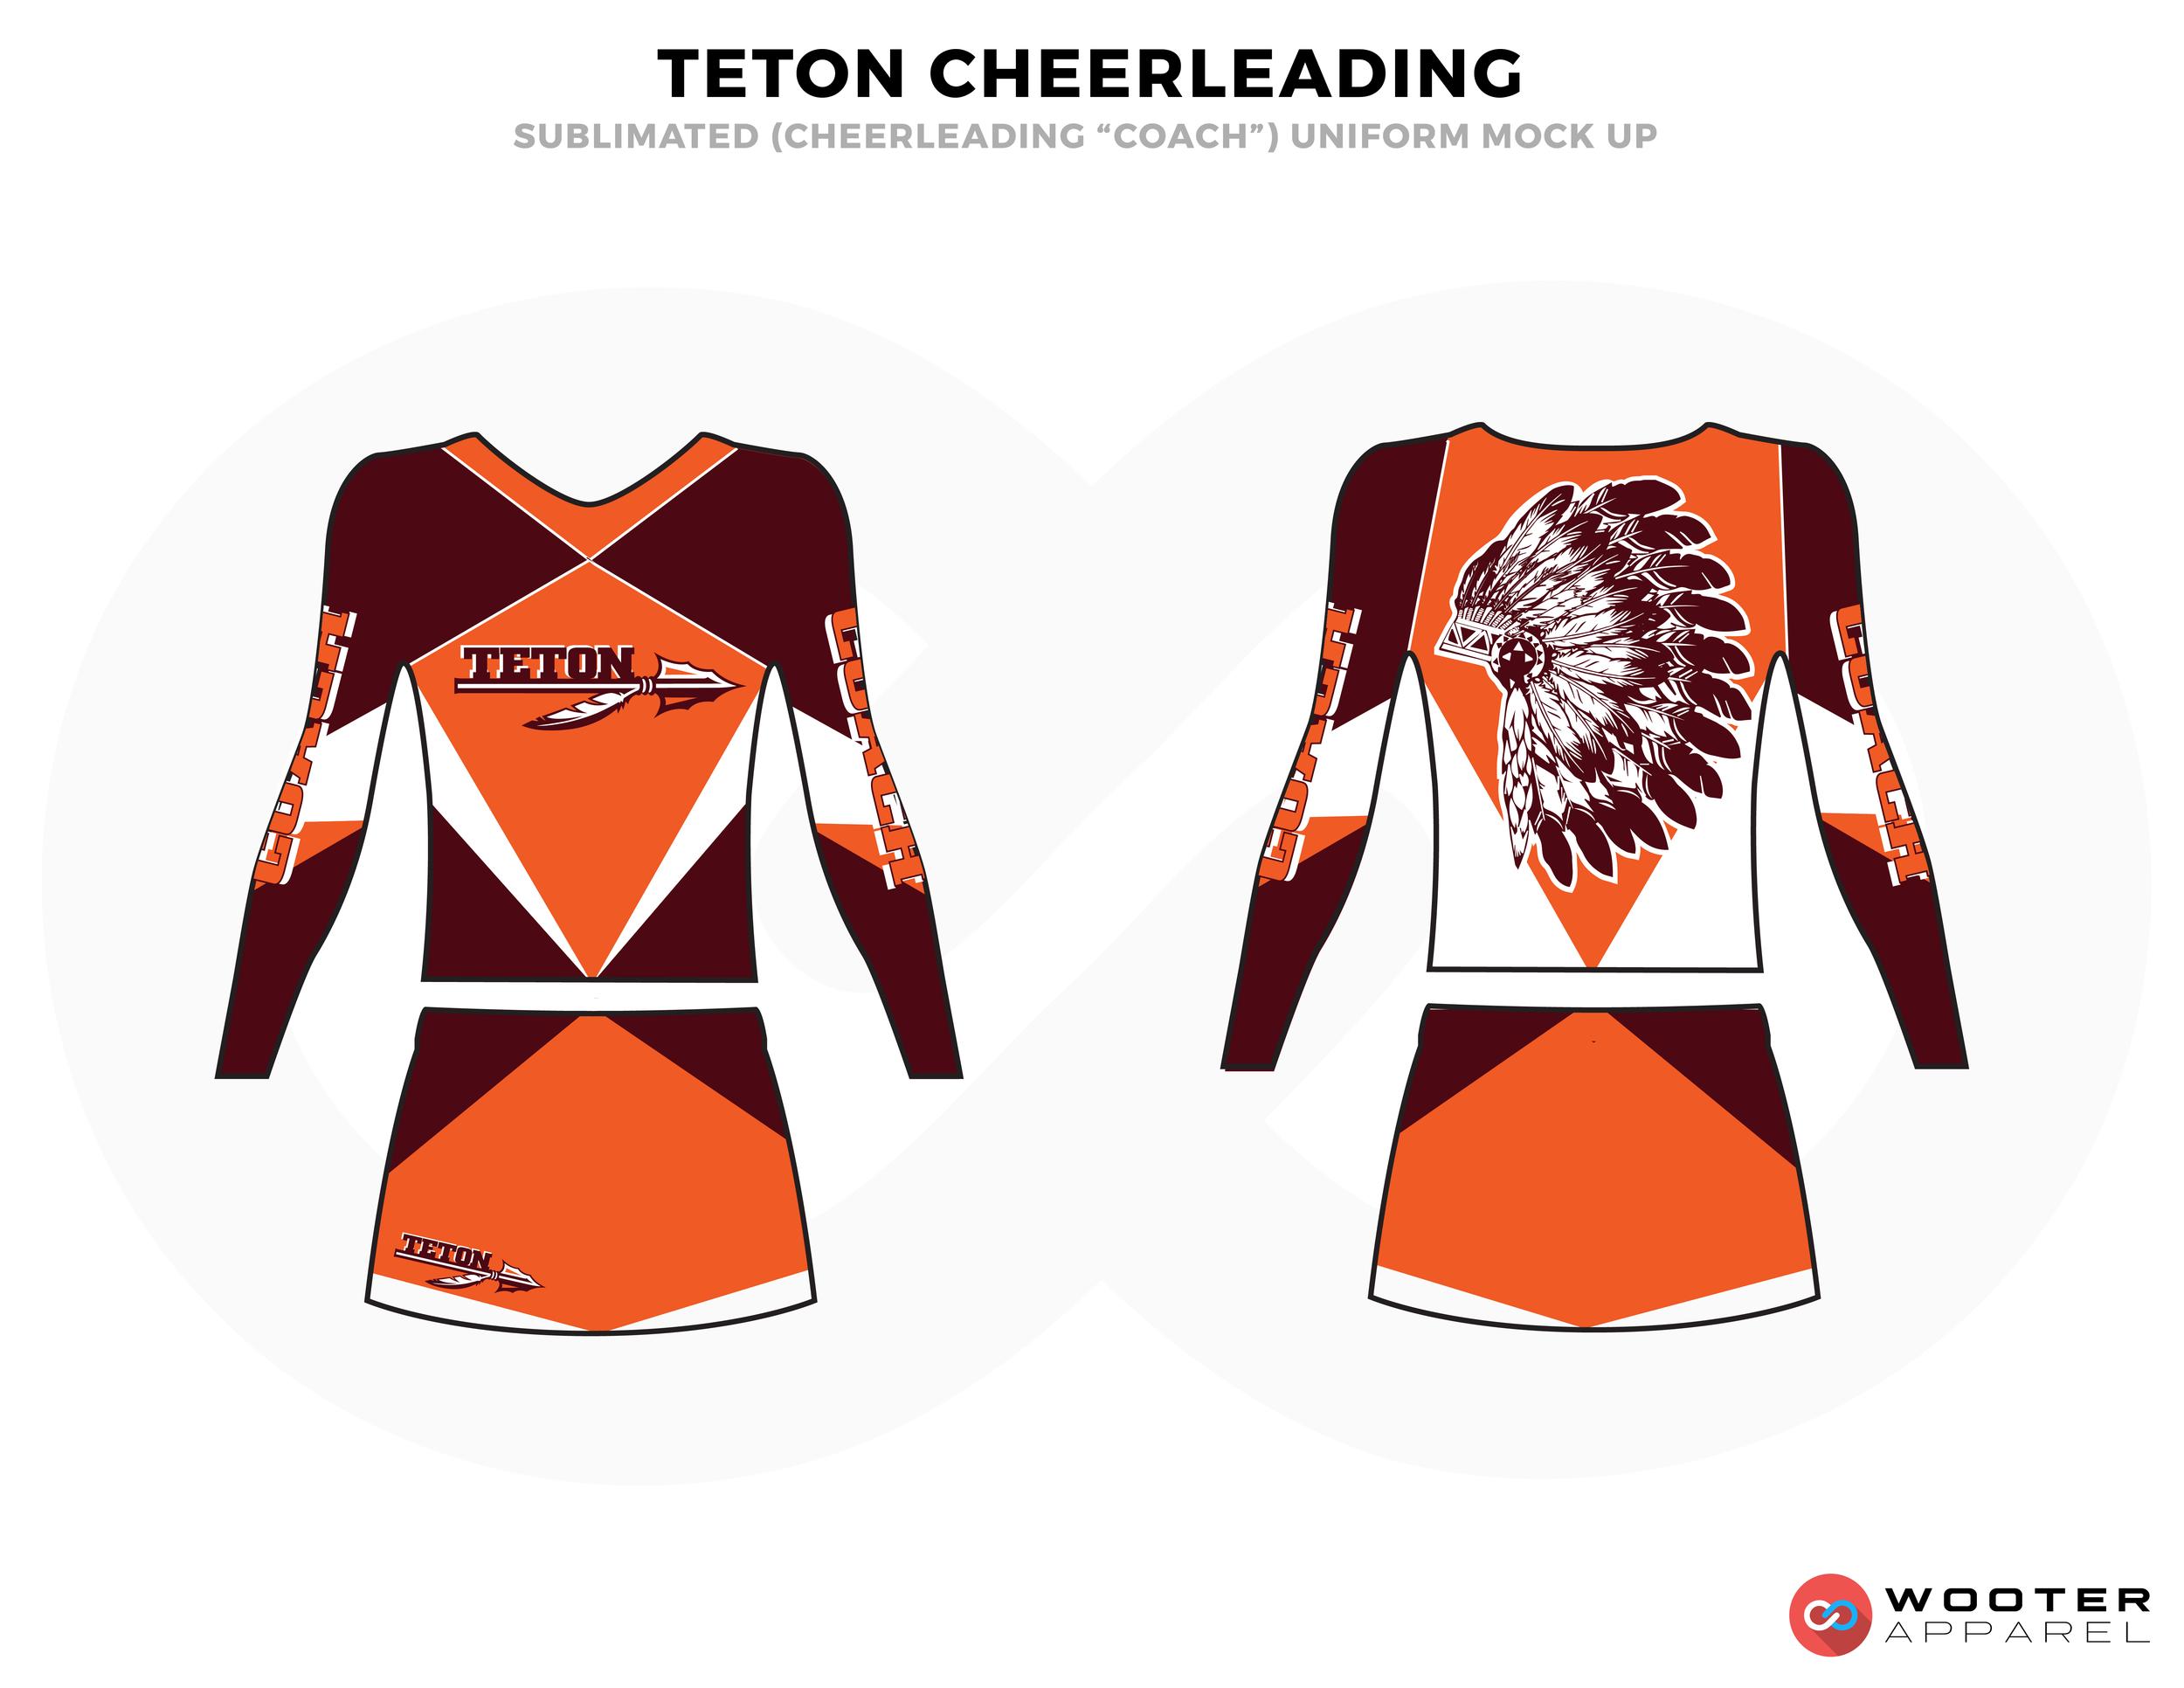 TETON maroon orange white cheerleading uniforms, top, and skirt